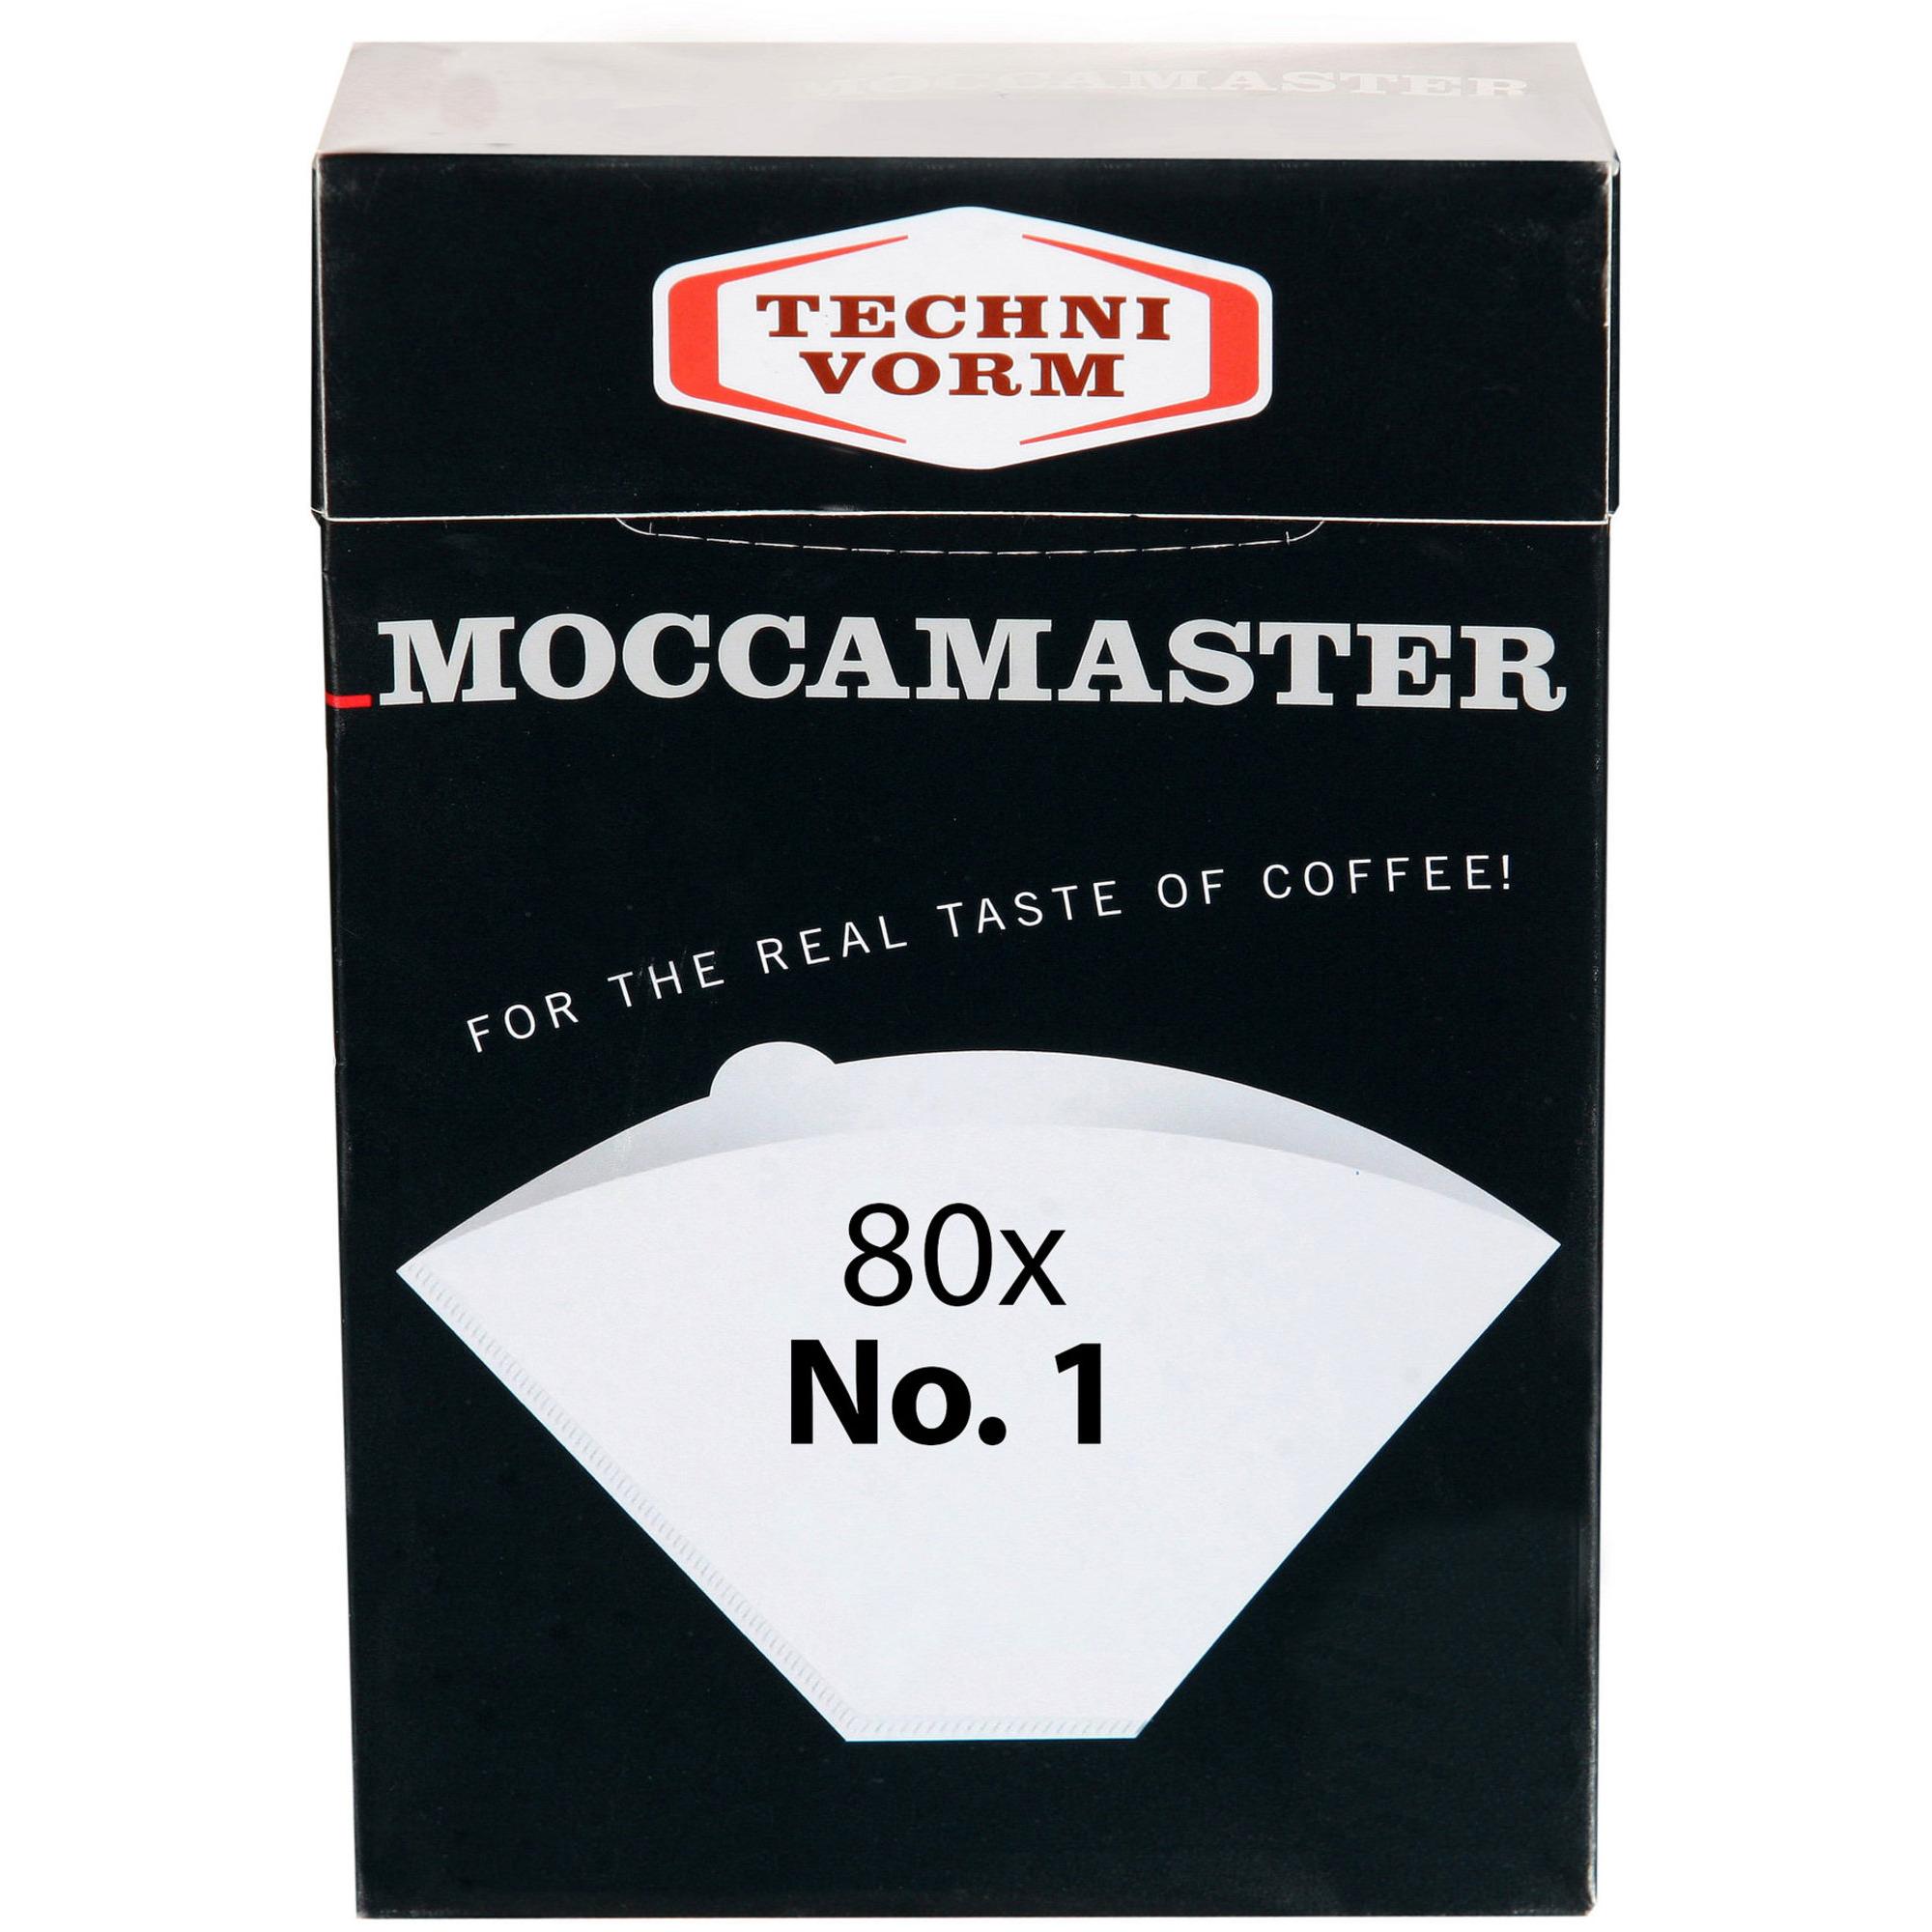 Moccamaster Kaffefilter storlek 1×1 80 st